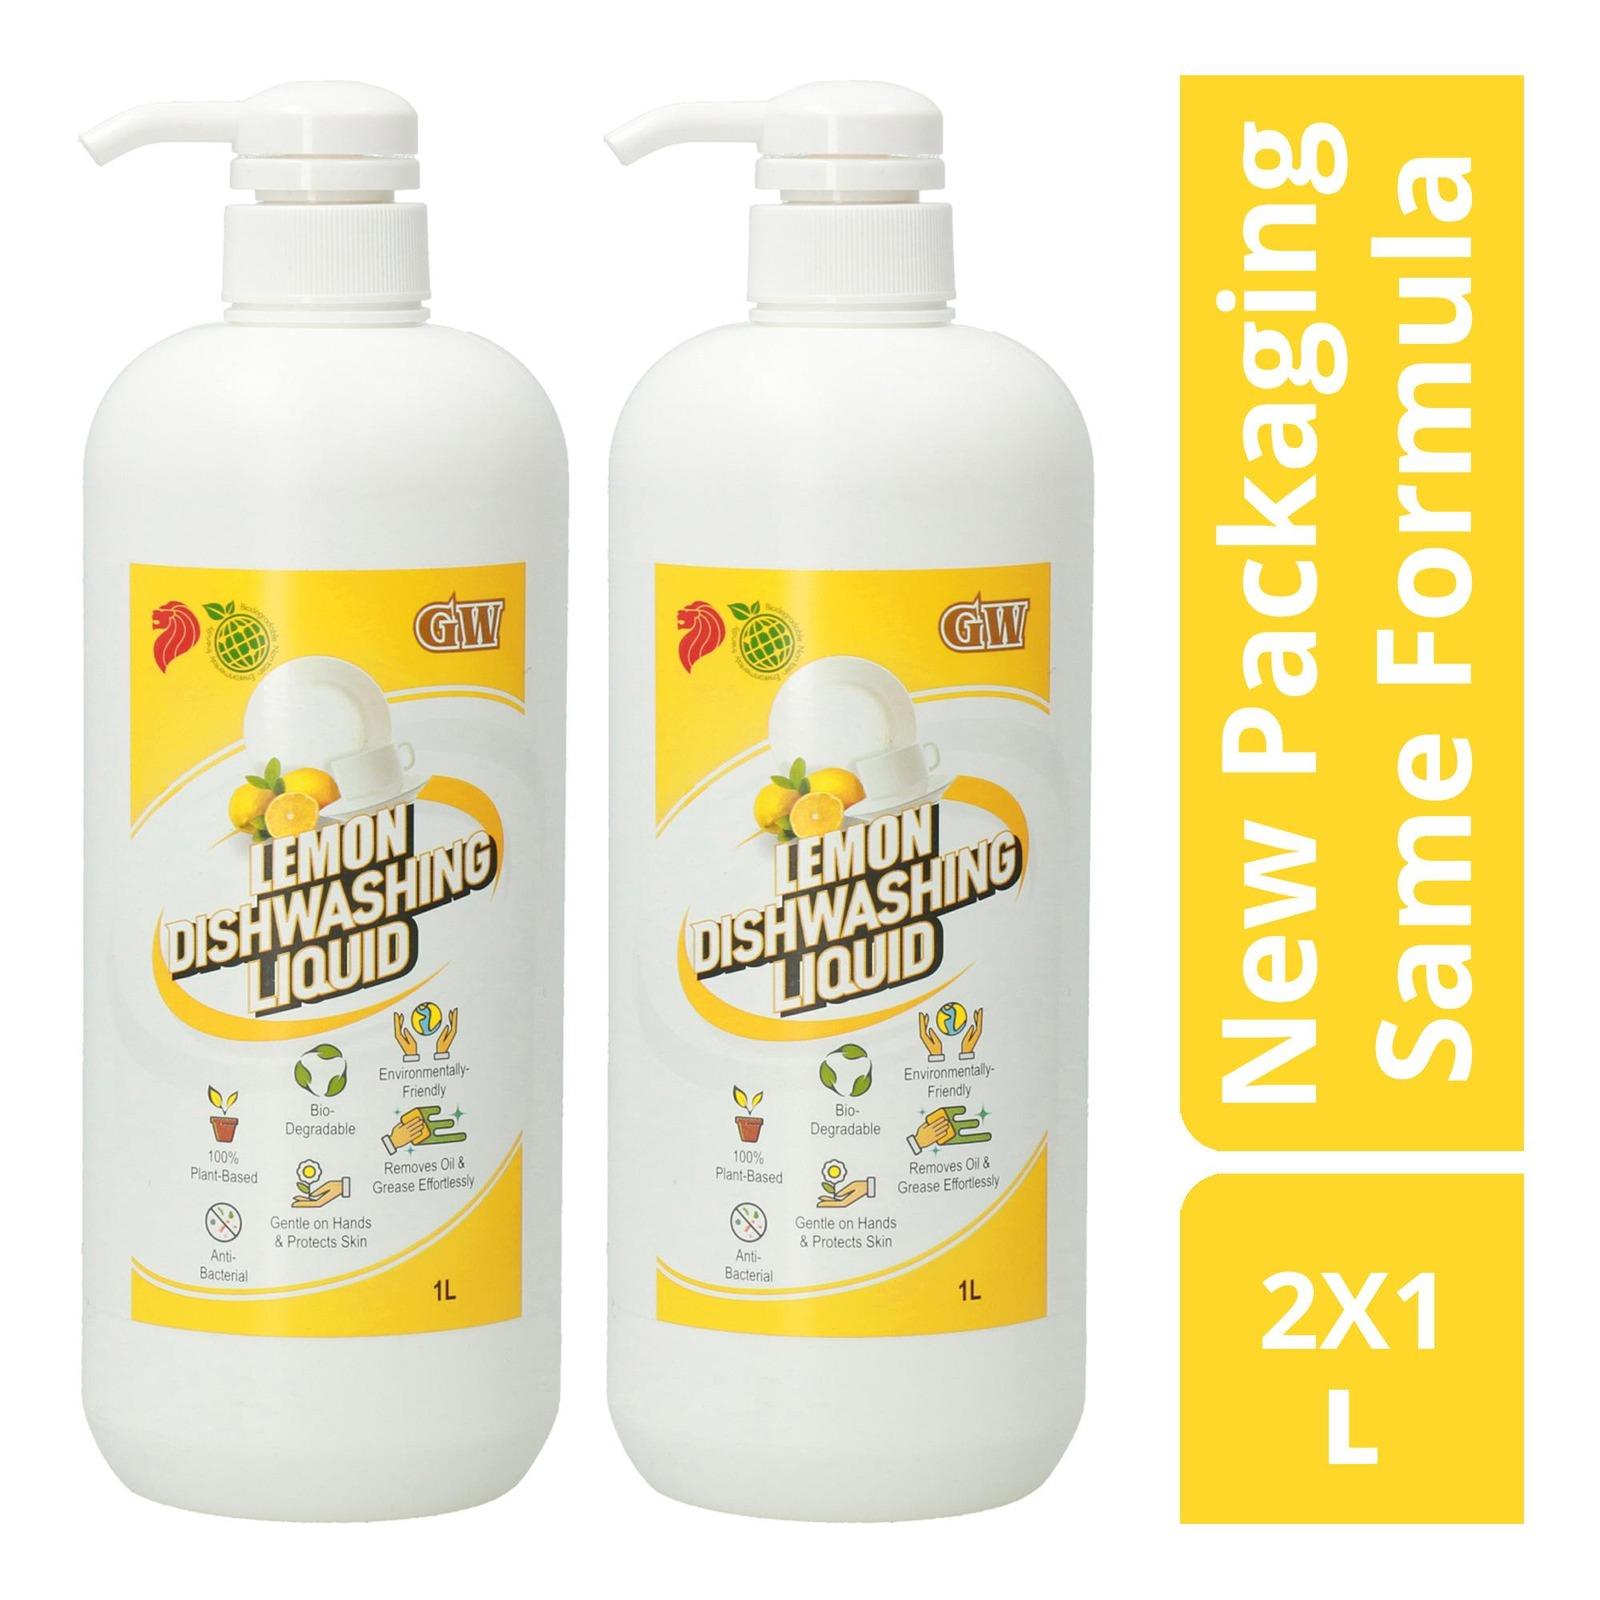 GW Anti-bacterial Dishwashing Liquid Pack - Lemon